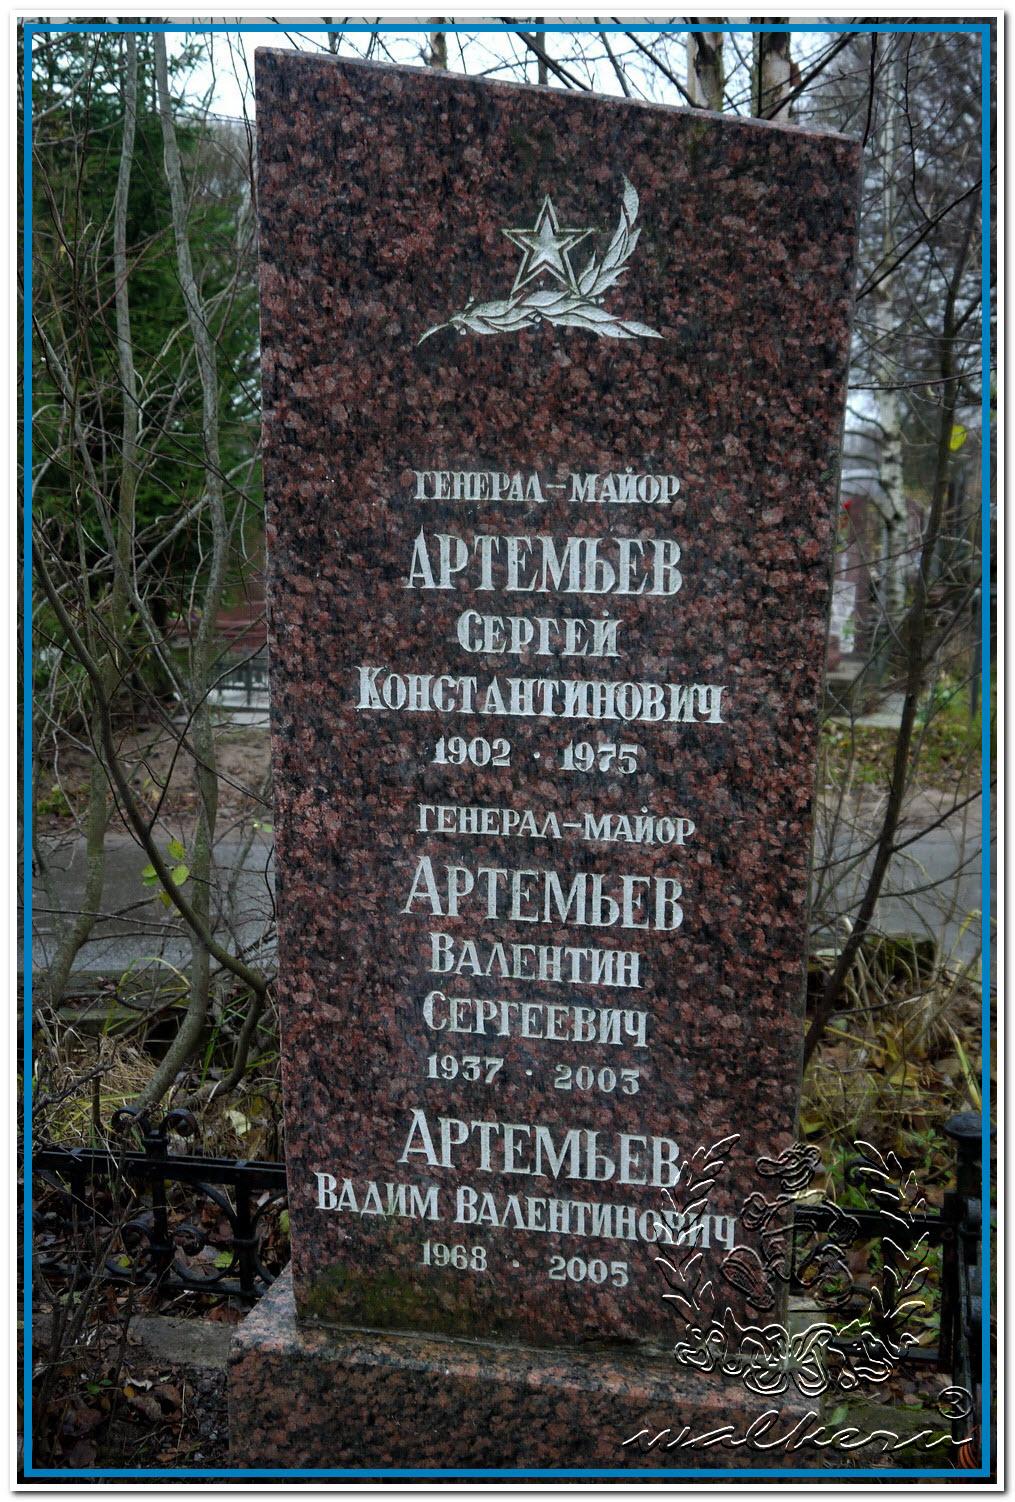 Артемьев Валентин Сергеевич